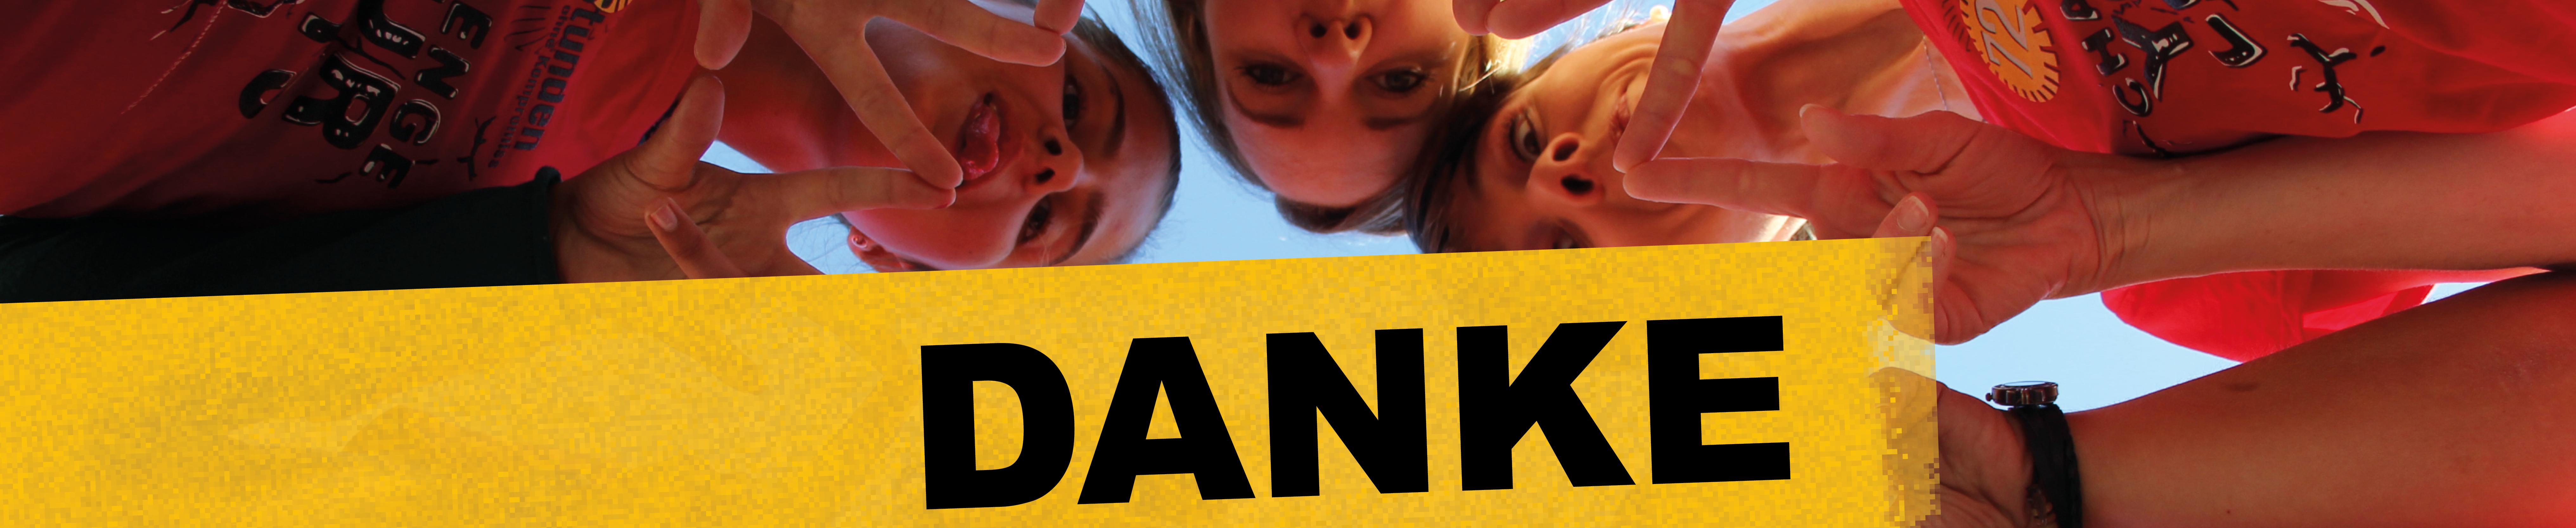 DANKE_Titel_HP